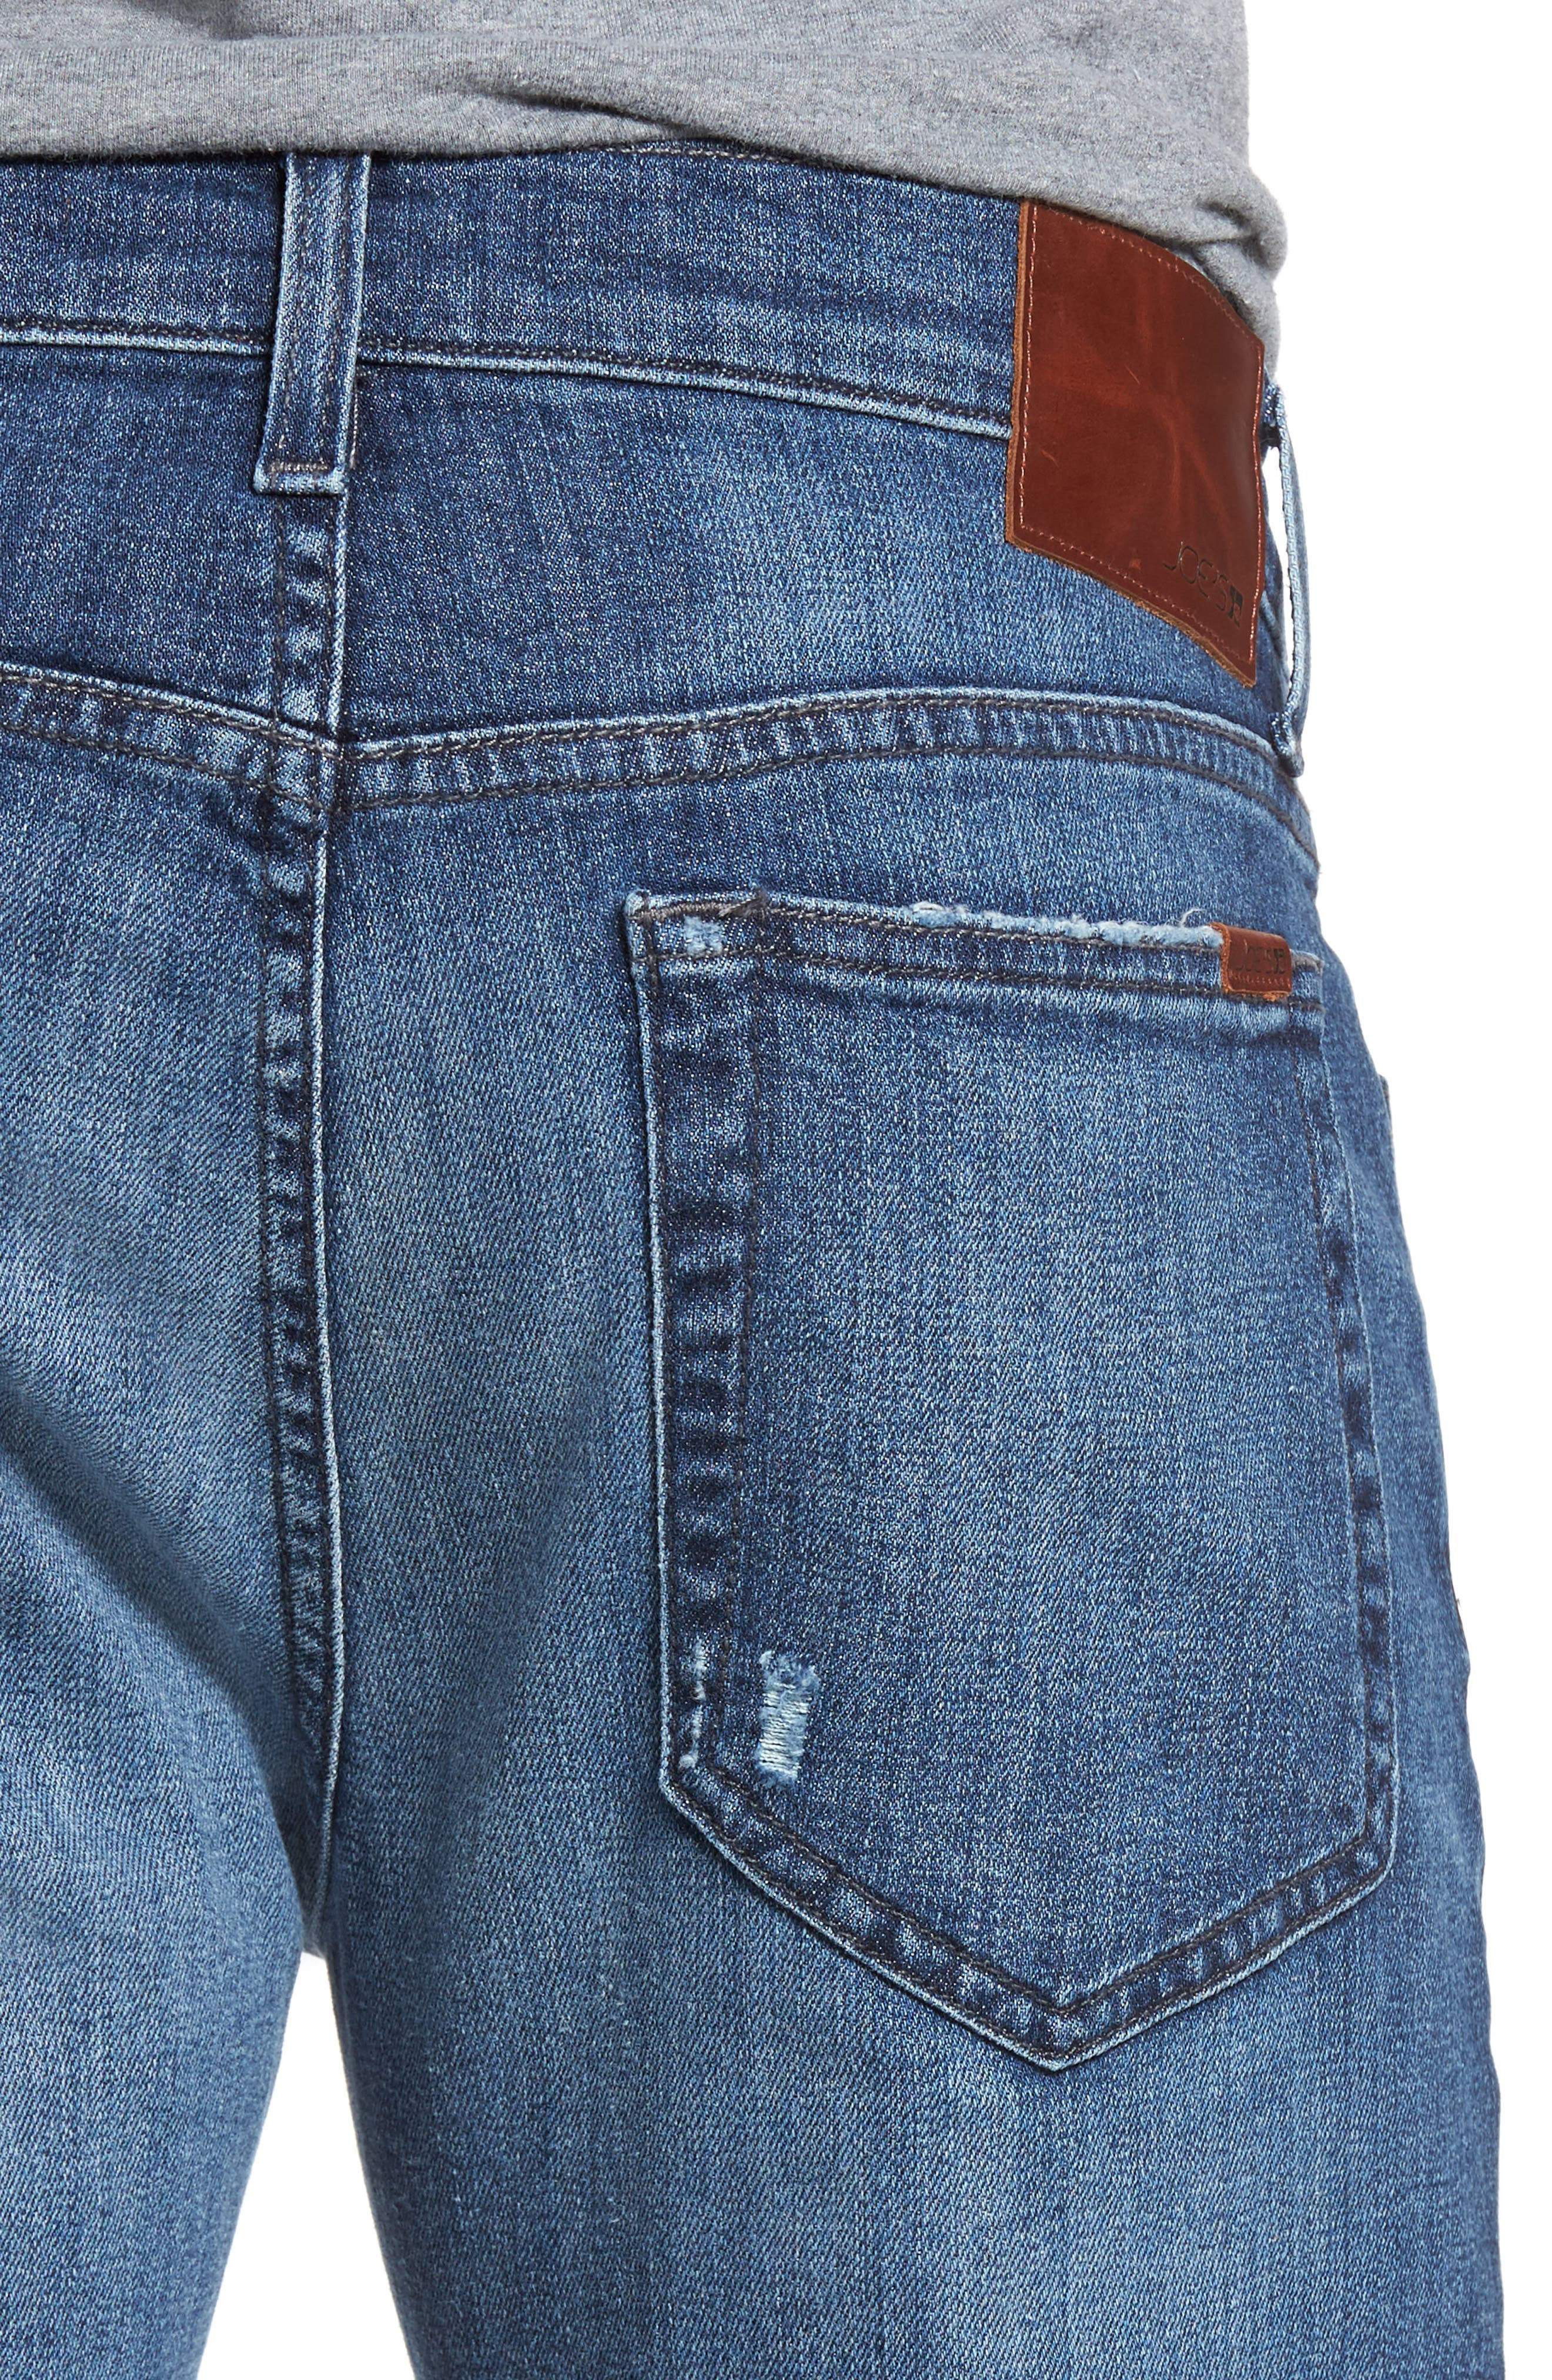 Brixton Slim Straight Leg Jeans,                             Alternate thumbnail 4, color,                             410